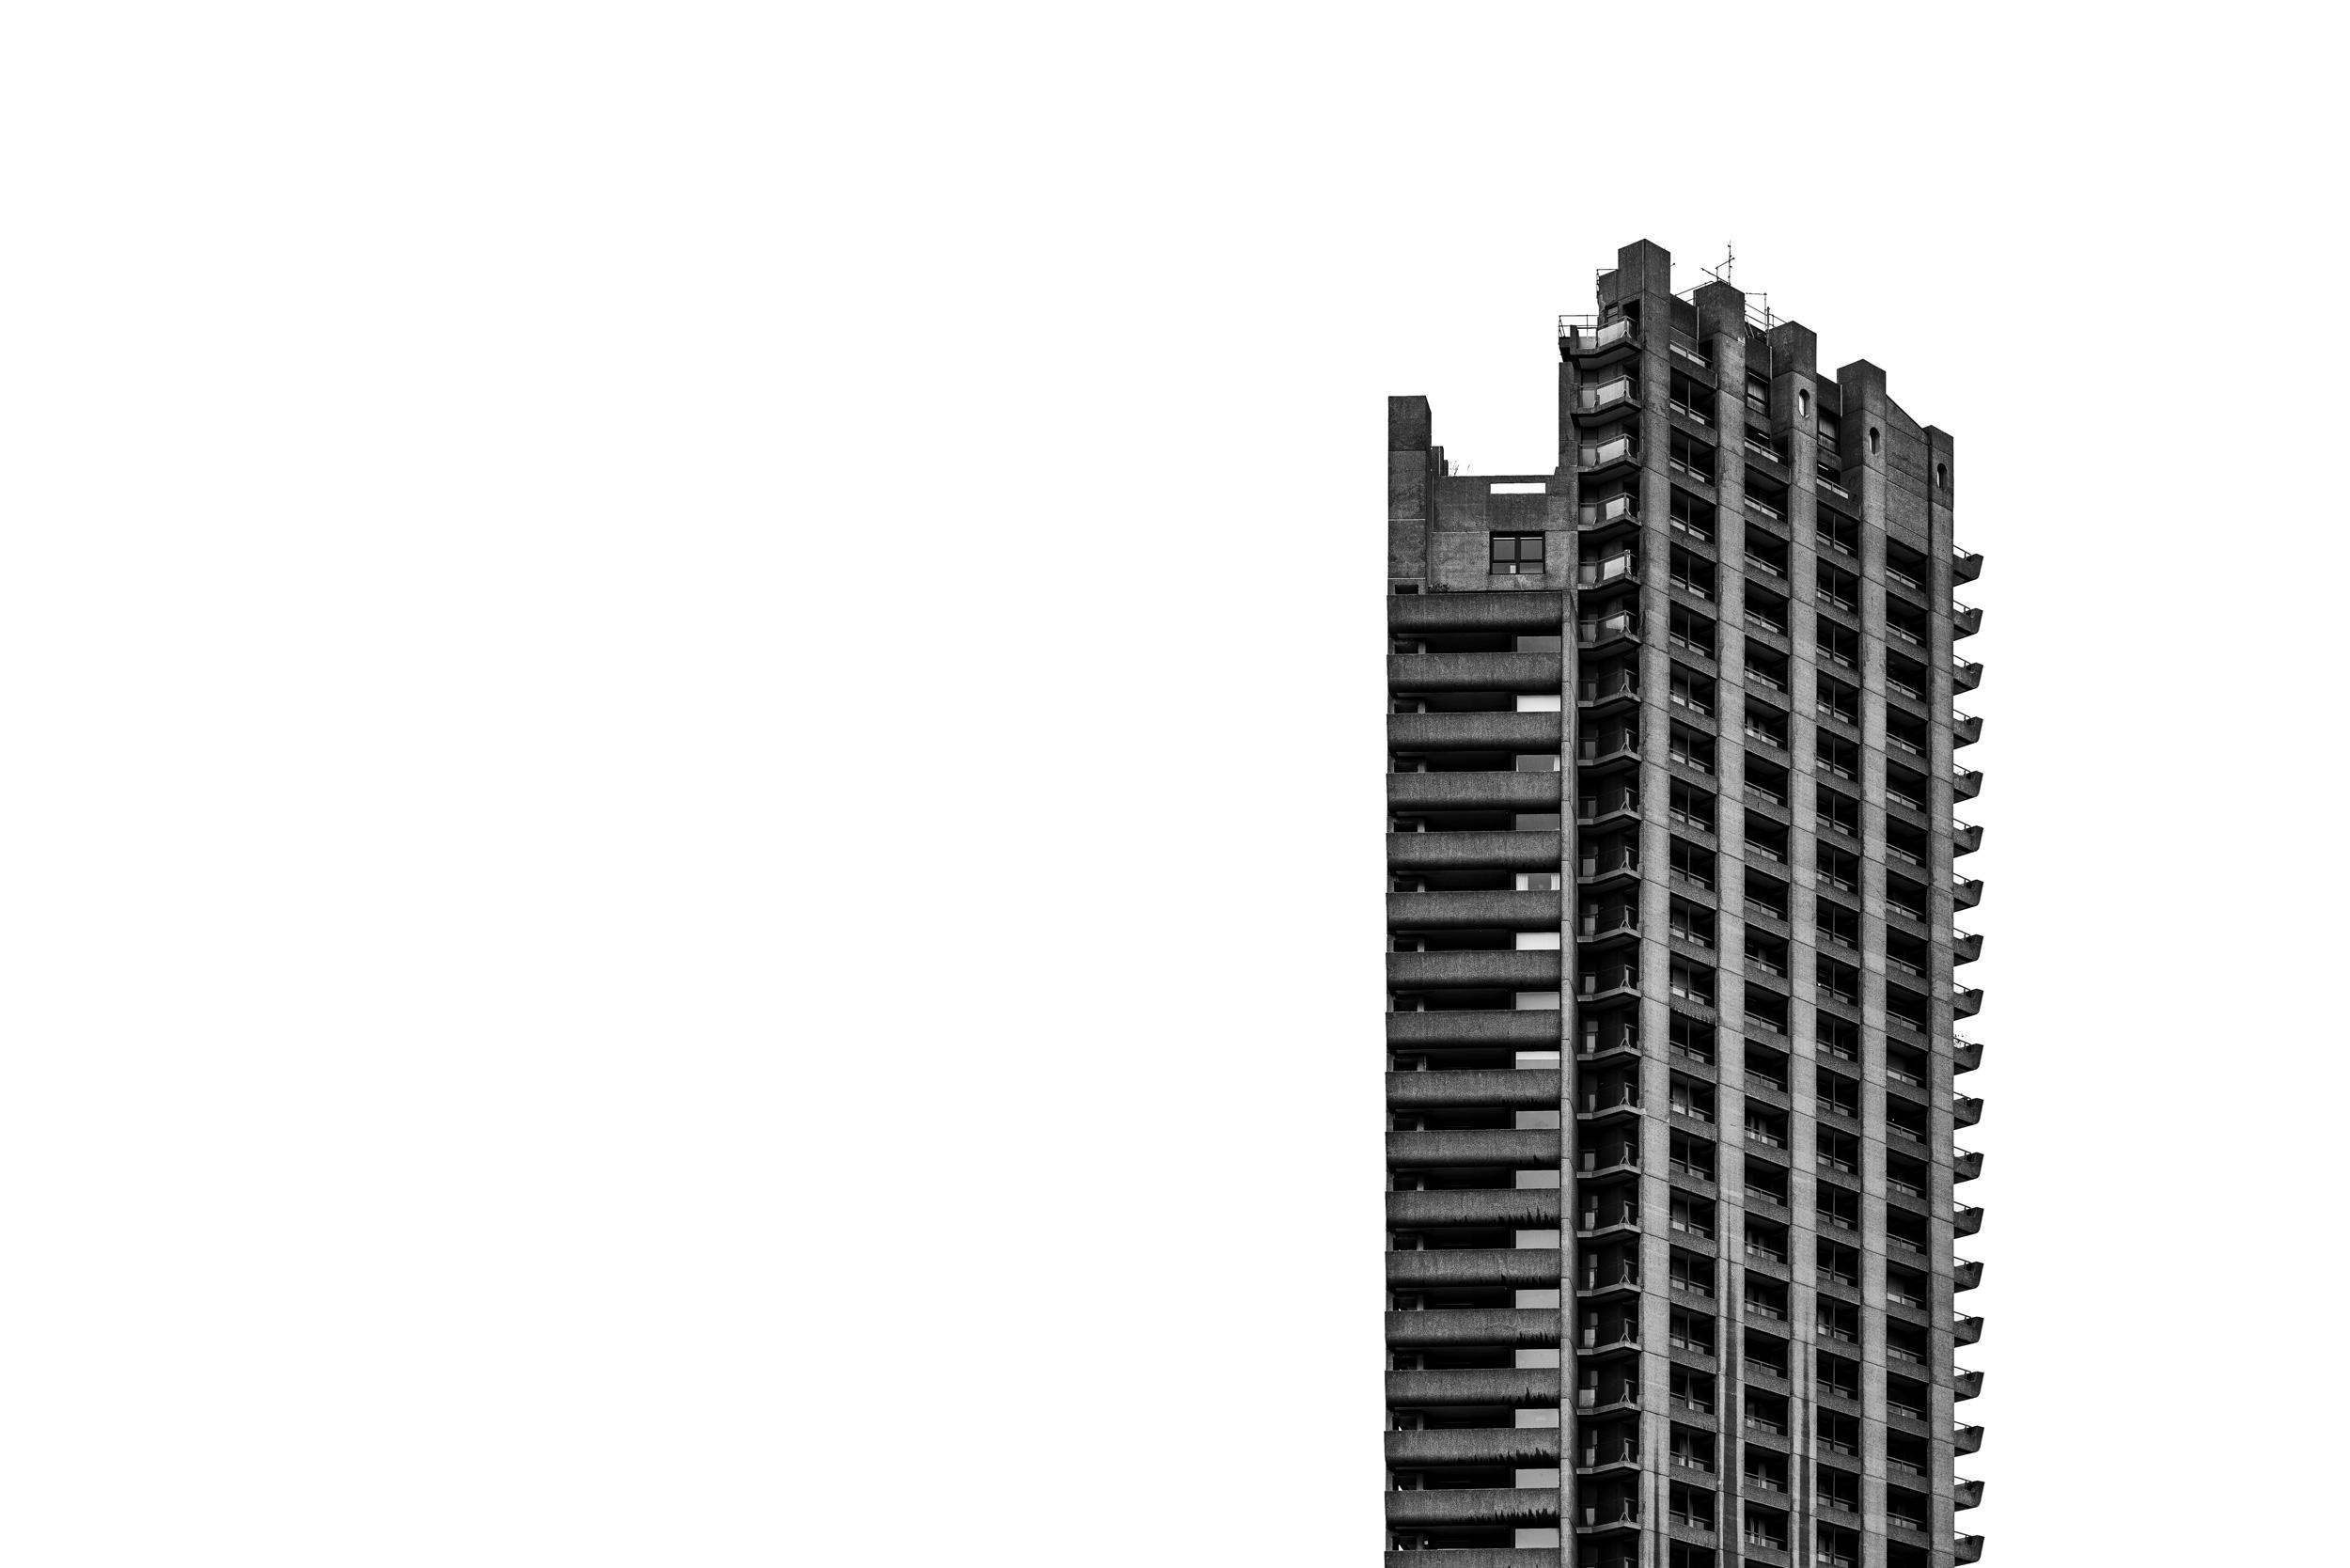 'Barbican Centre Tower Block View' (2018) - taken on my recent Architecture Workshop